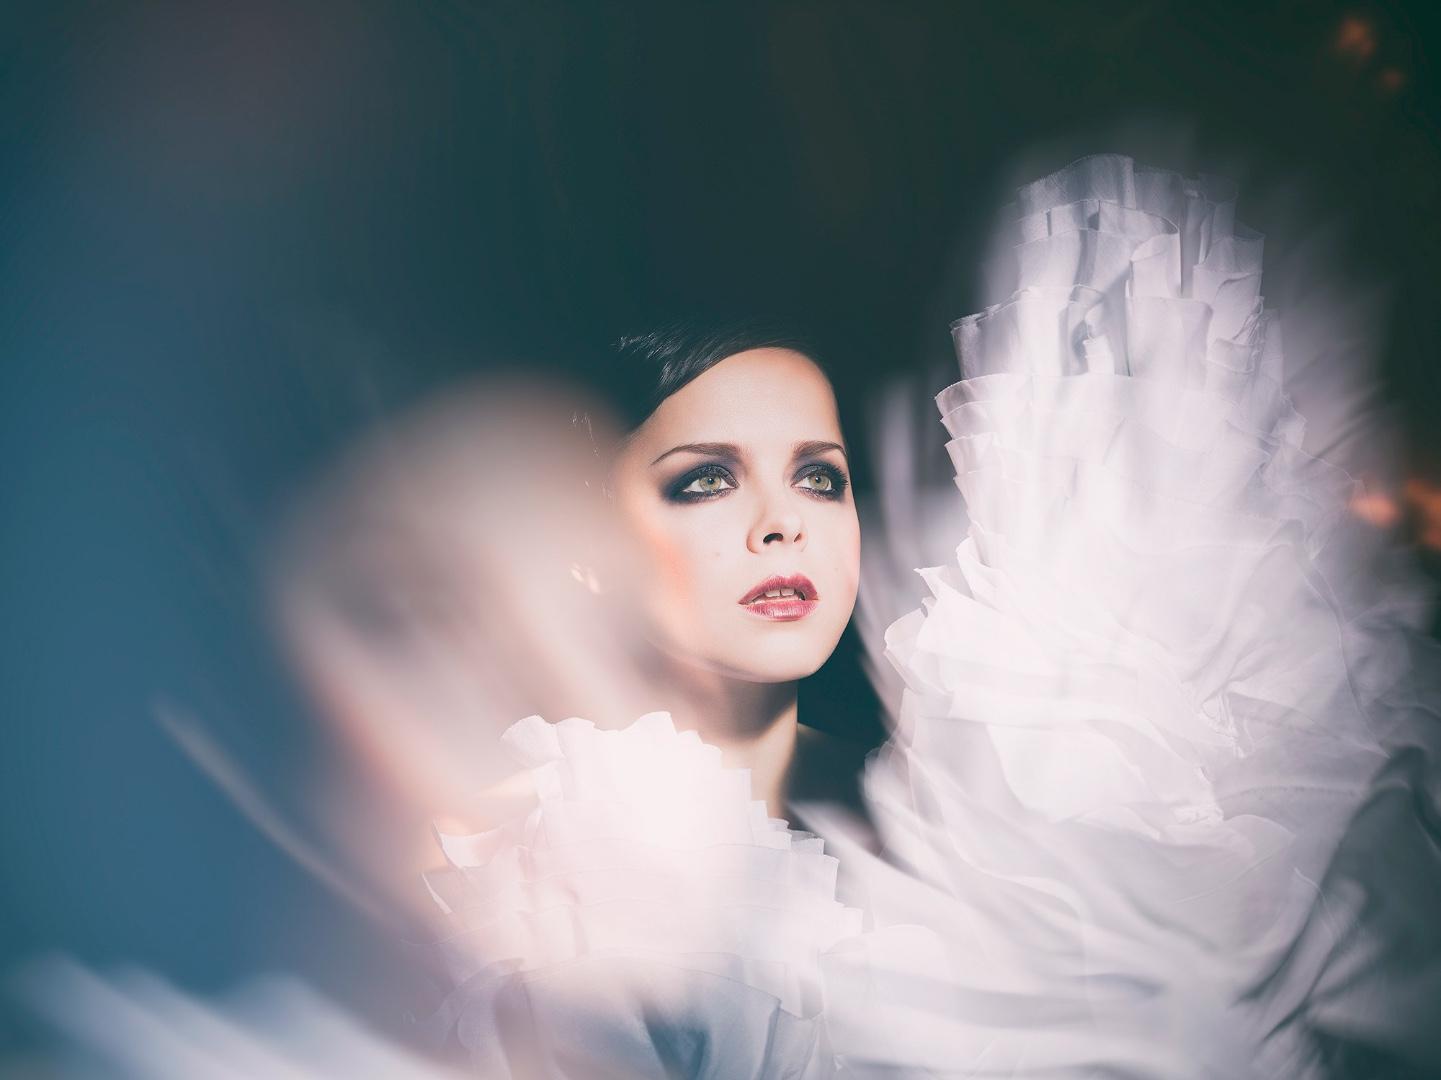 Наталья медведева певица фото